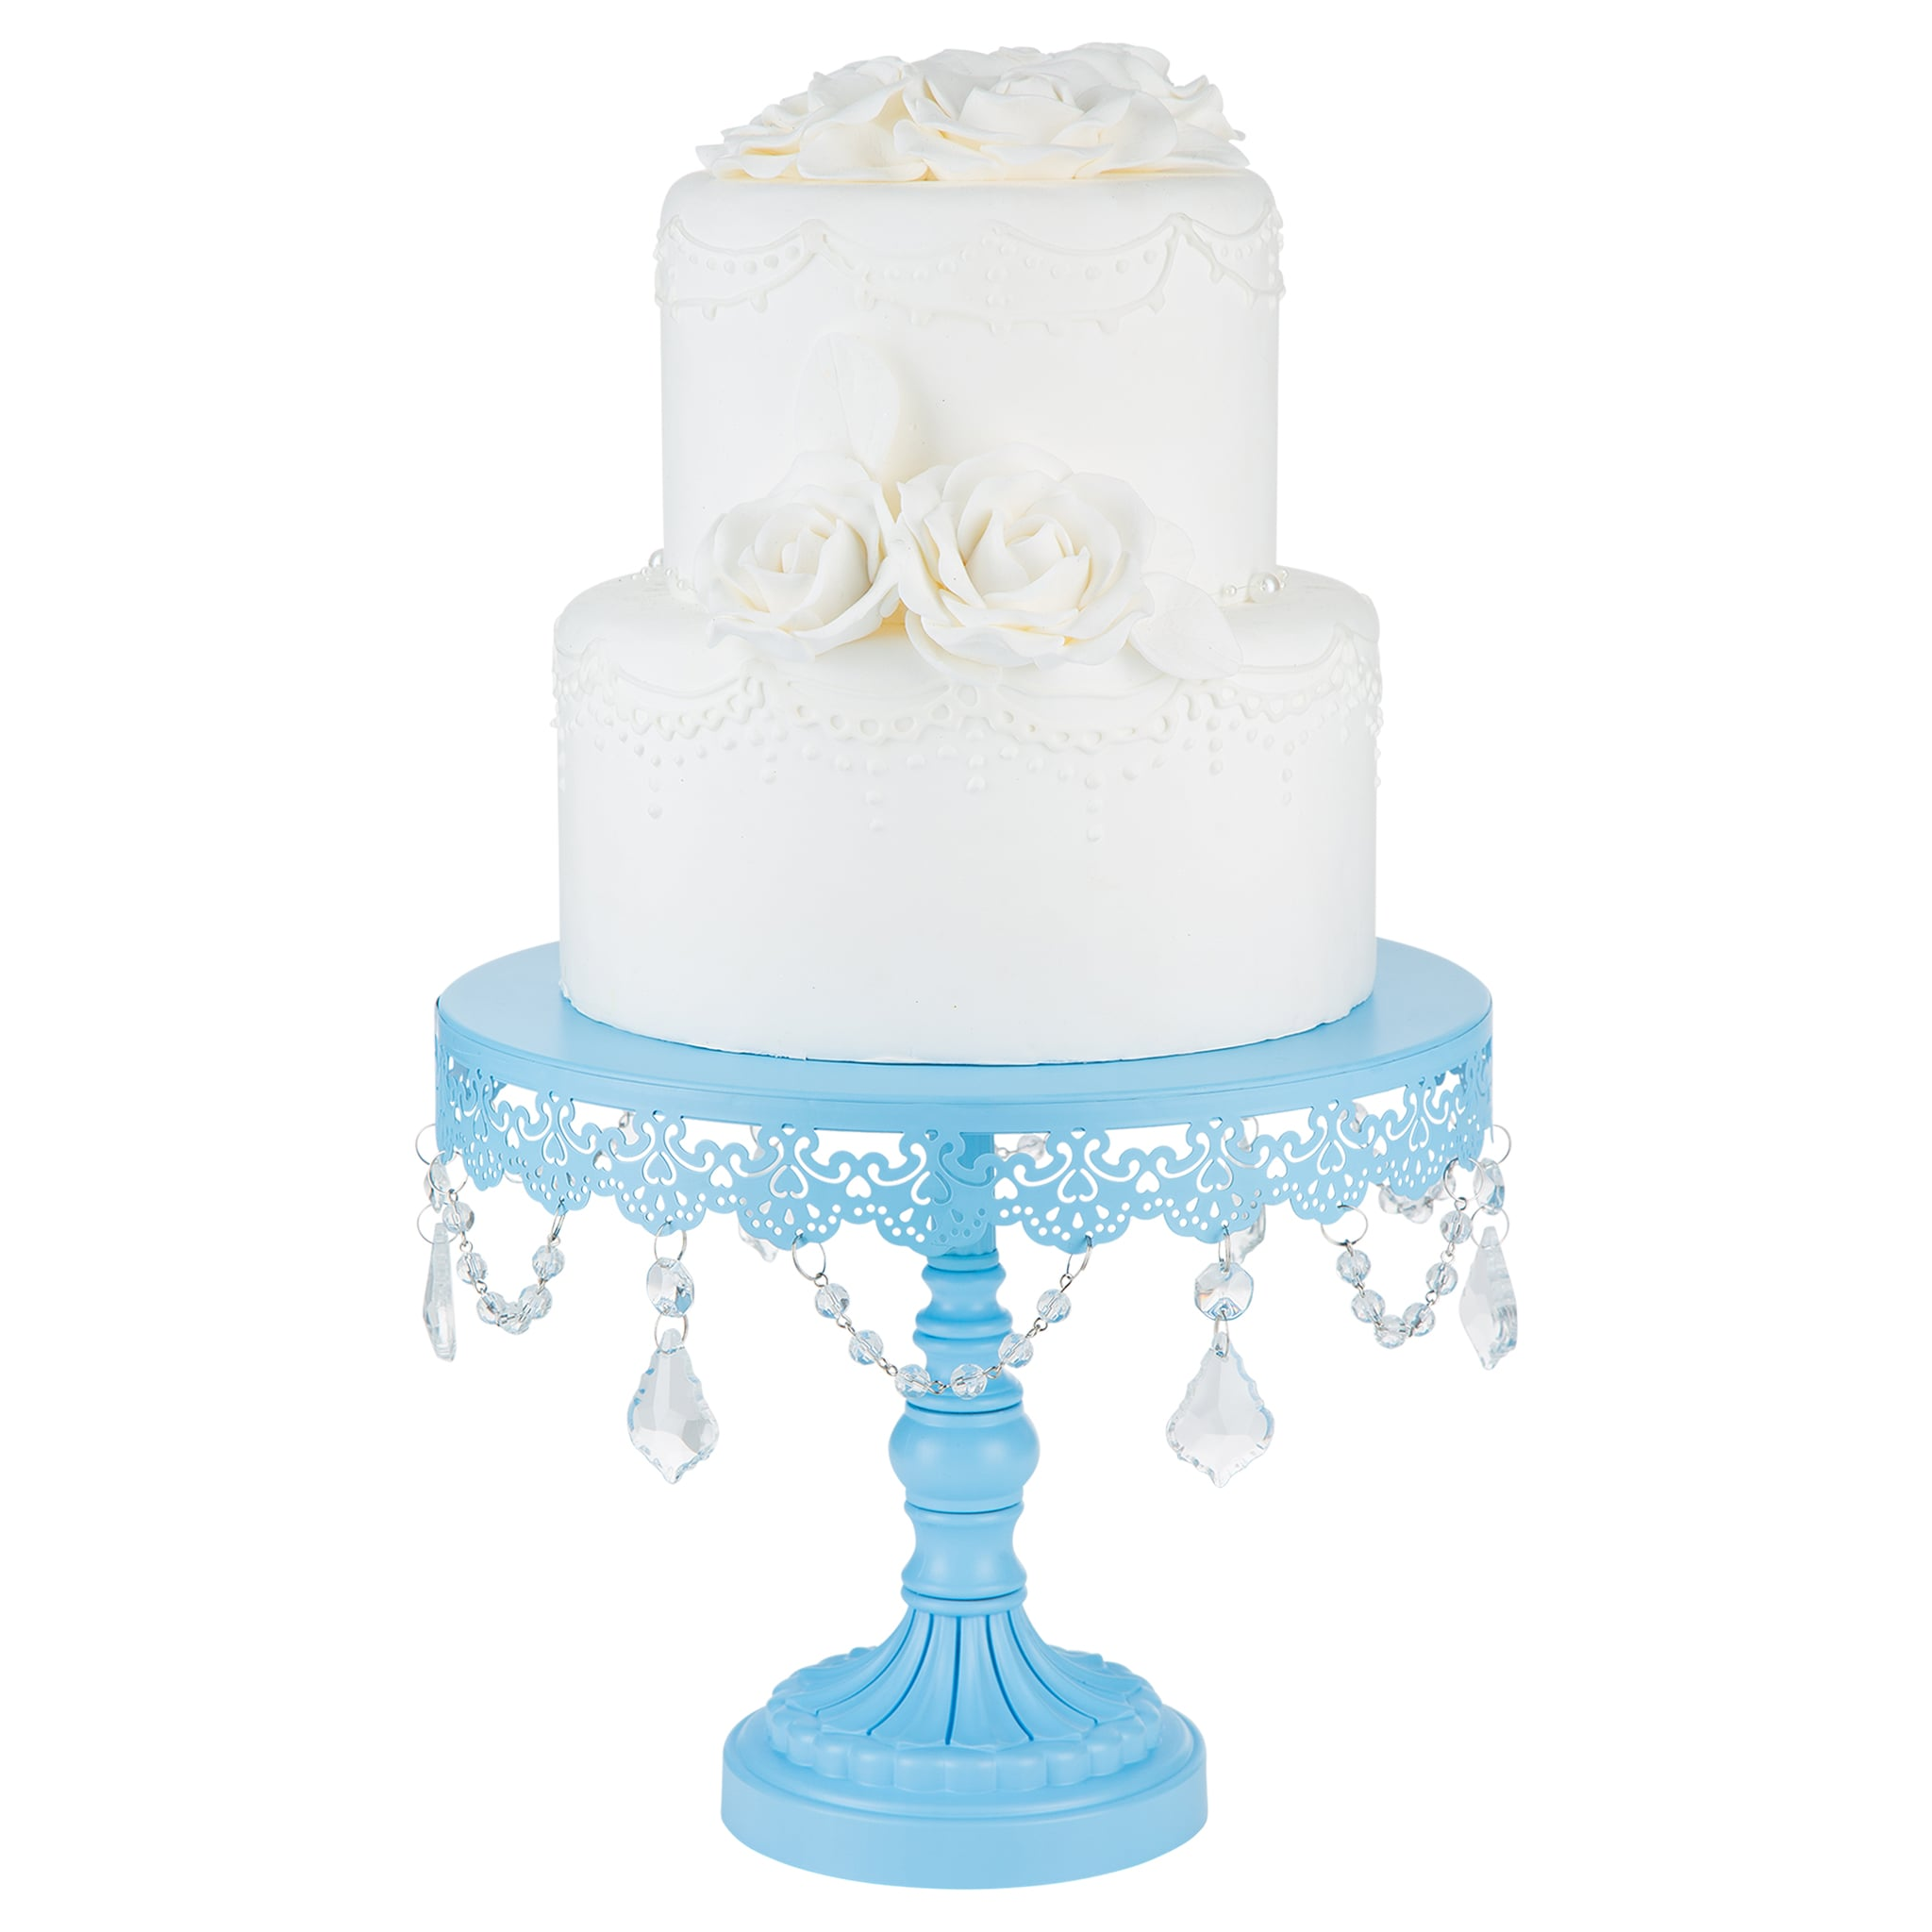 Amalfi Decor 10-Inch Crystal Draped Round Metal Cake Stand | Sophia ...